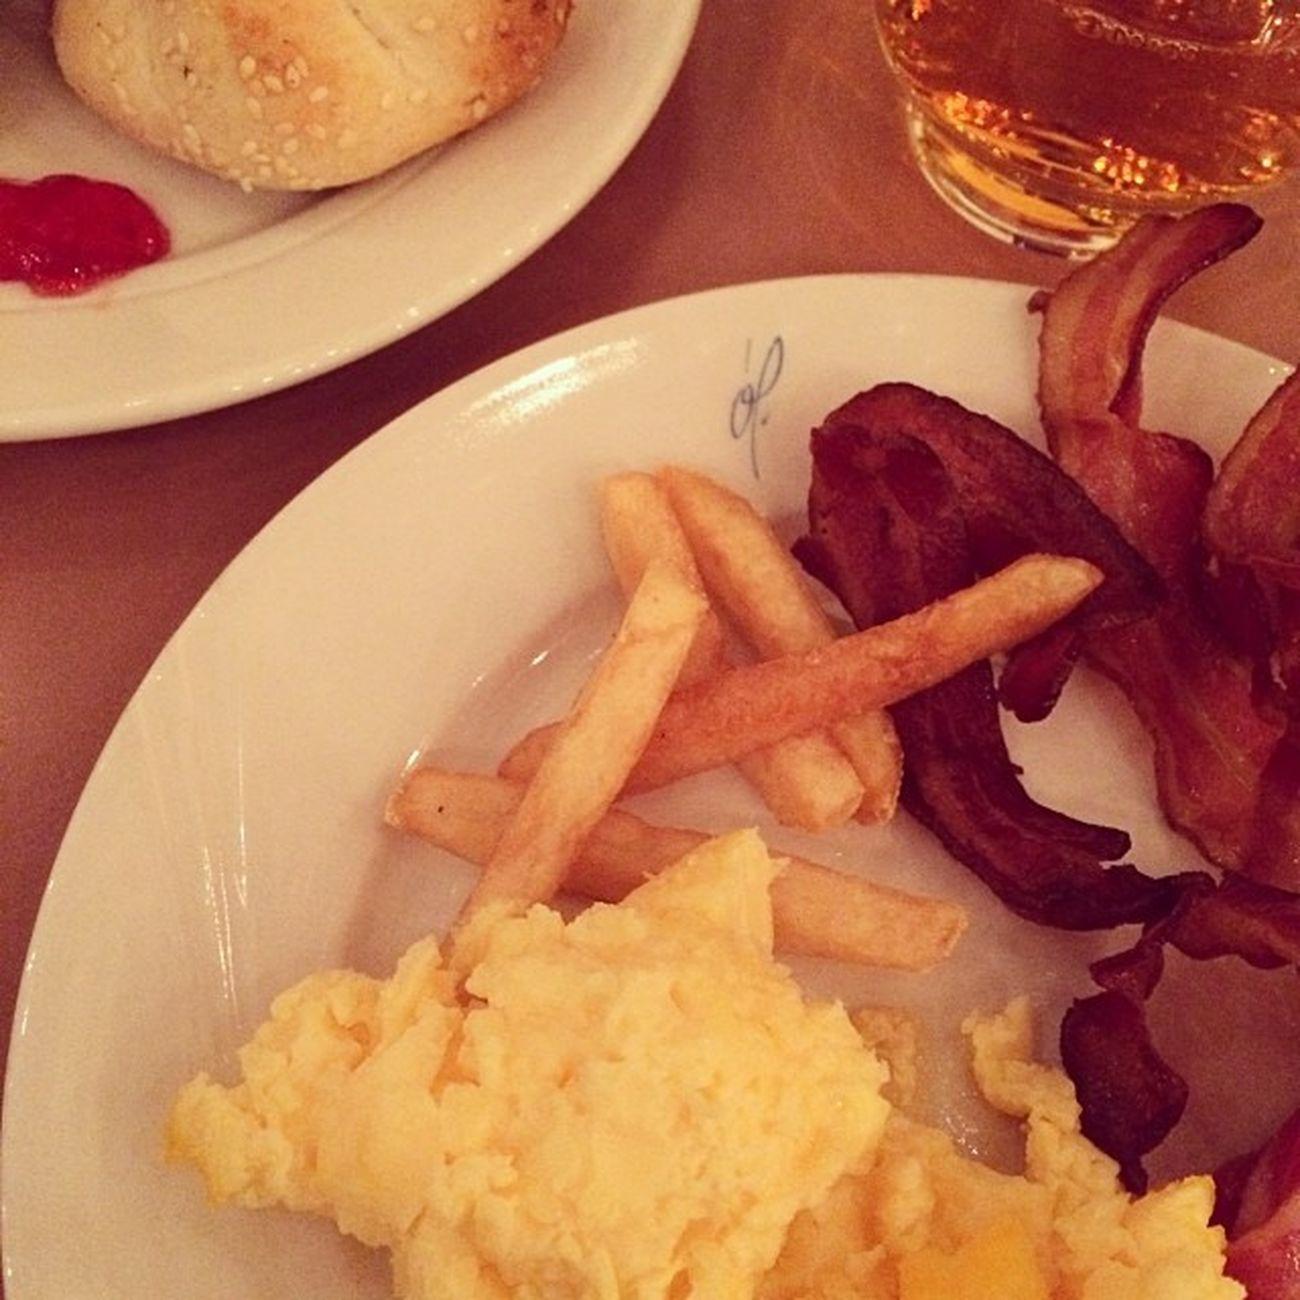 Pommes zum Frühstück! #iceland #reykjavik Food Iceland Reykjavik